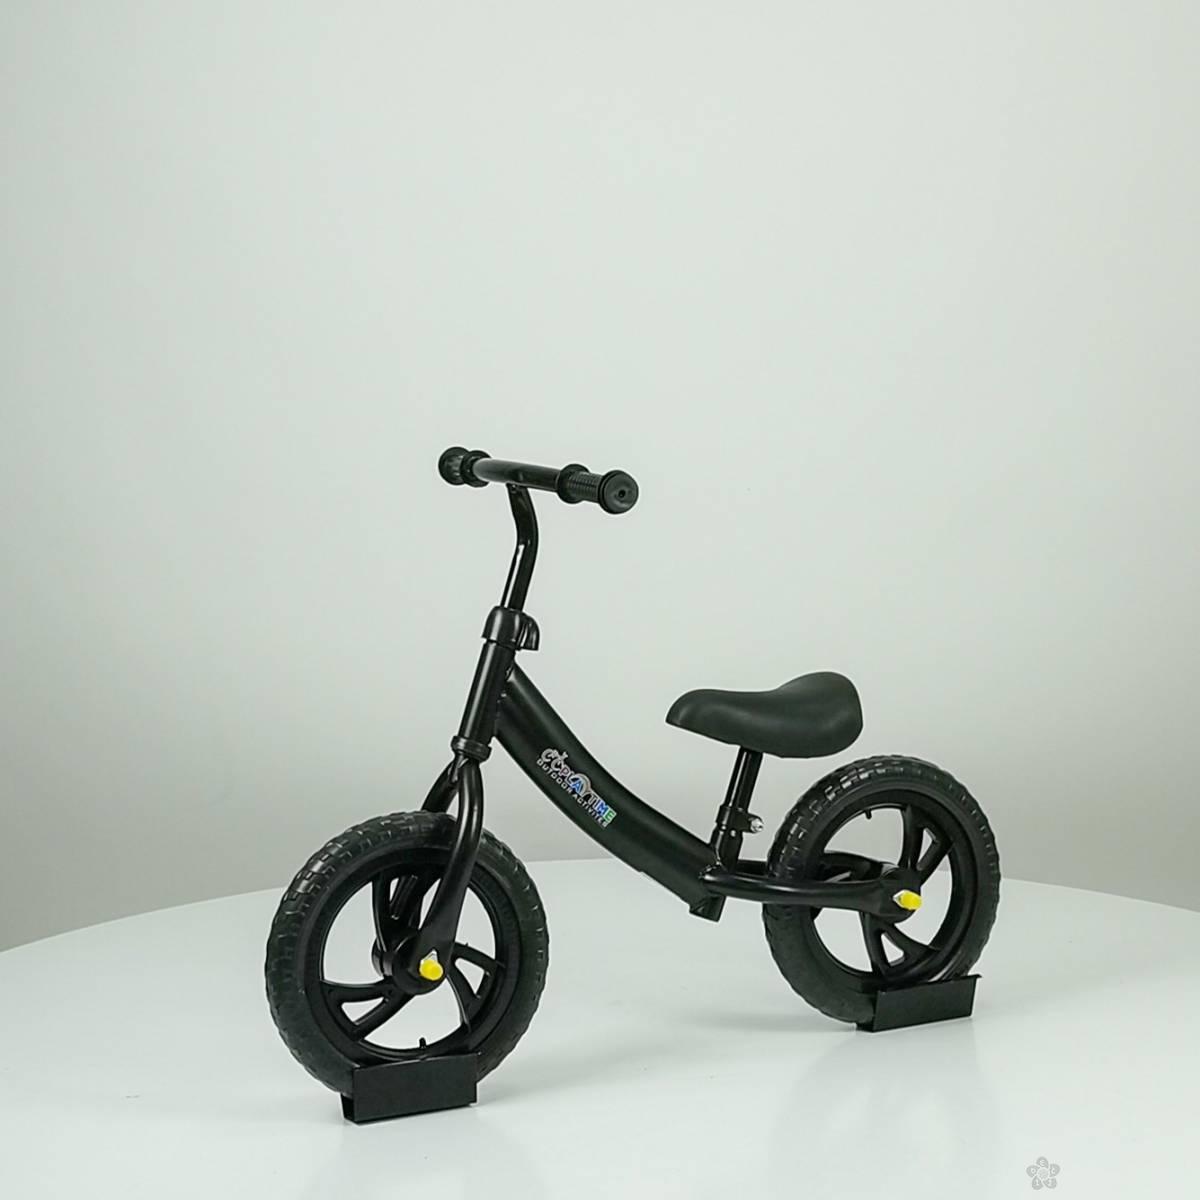 Balans bicikl model 752 crni